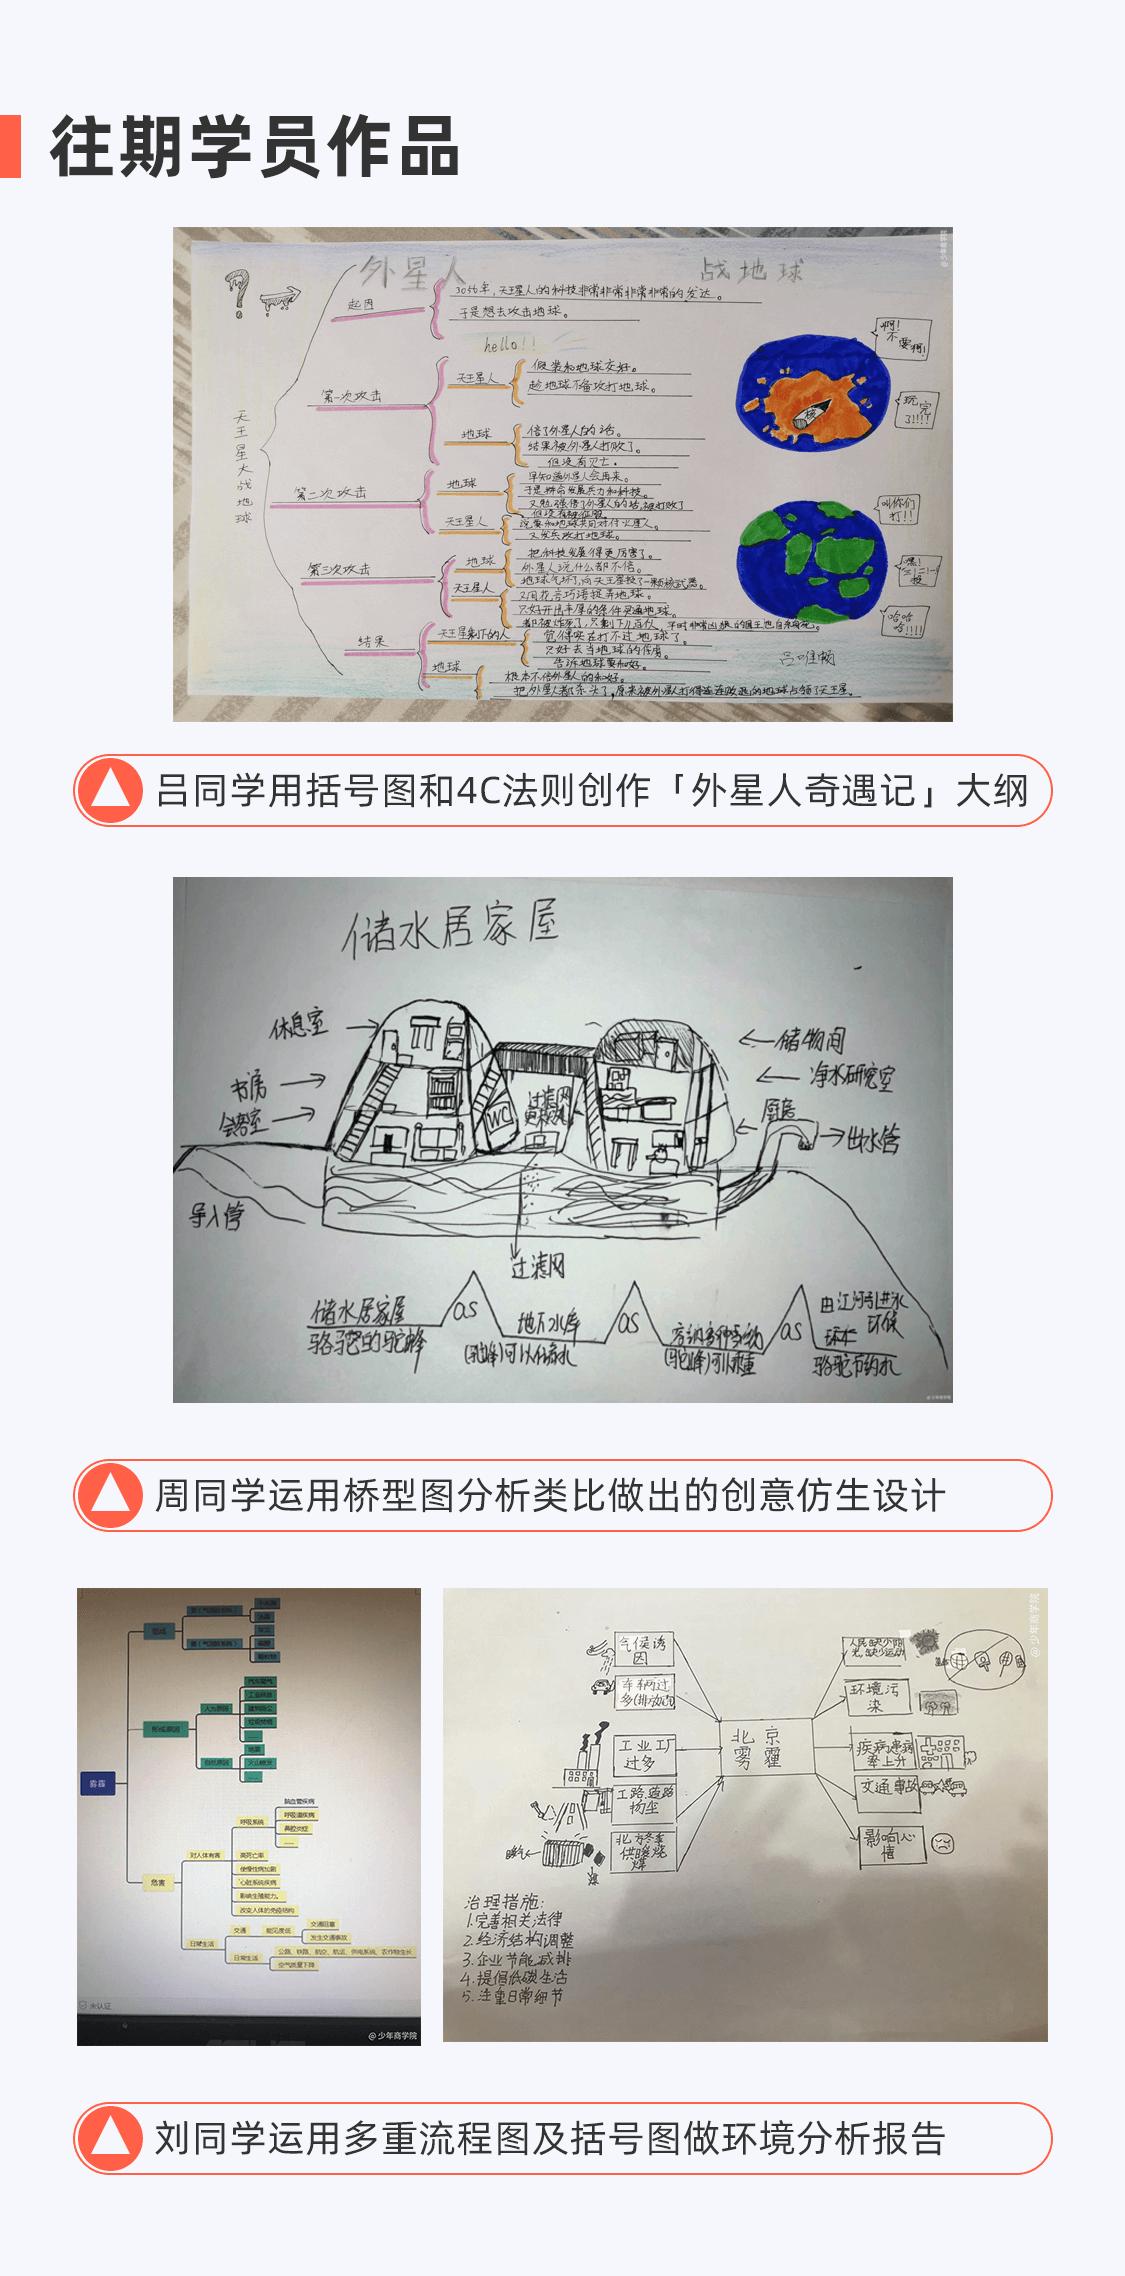 青少年思维导图3_04.png